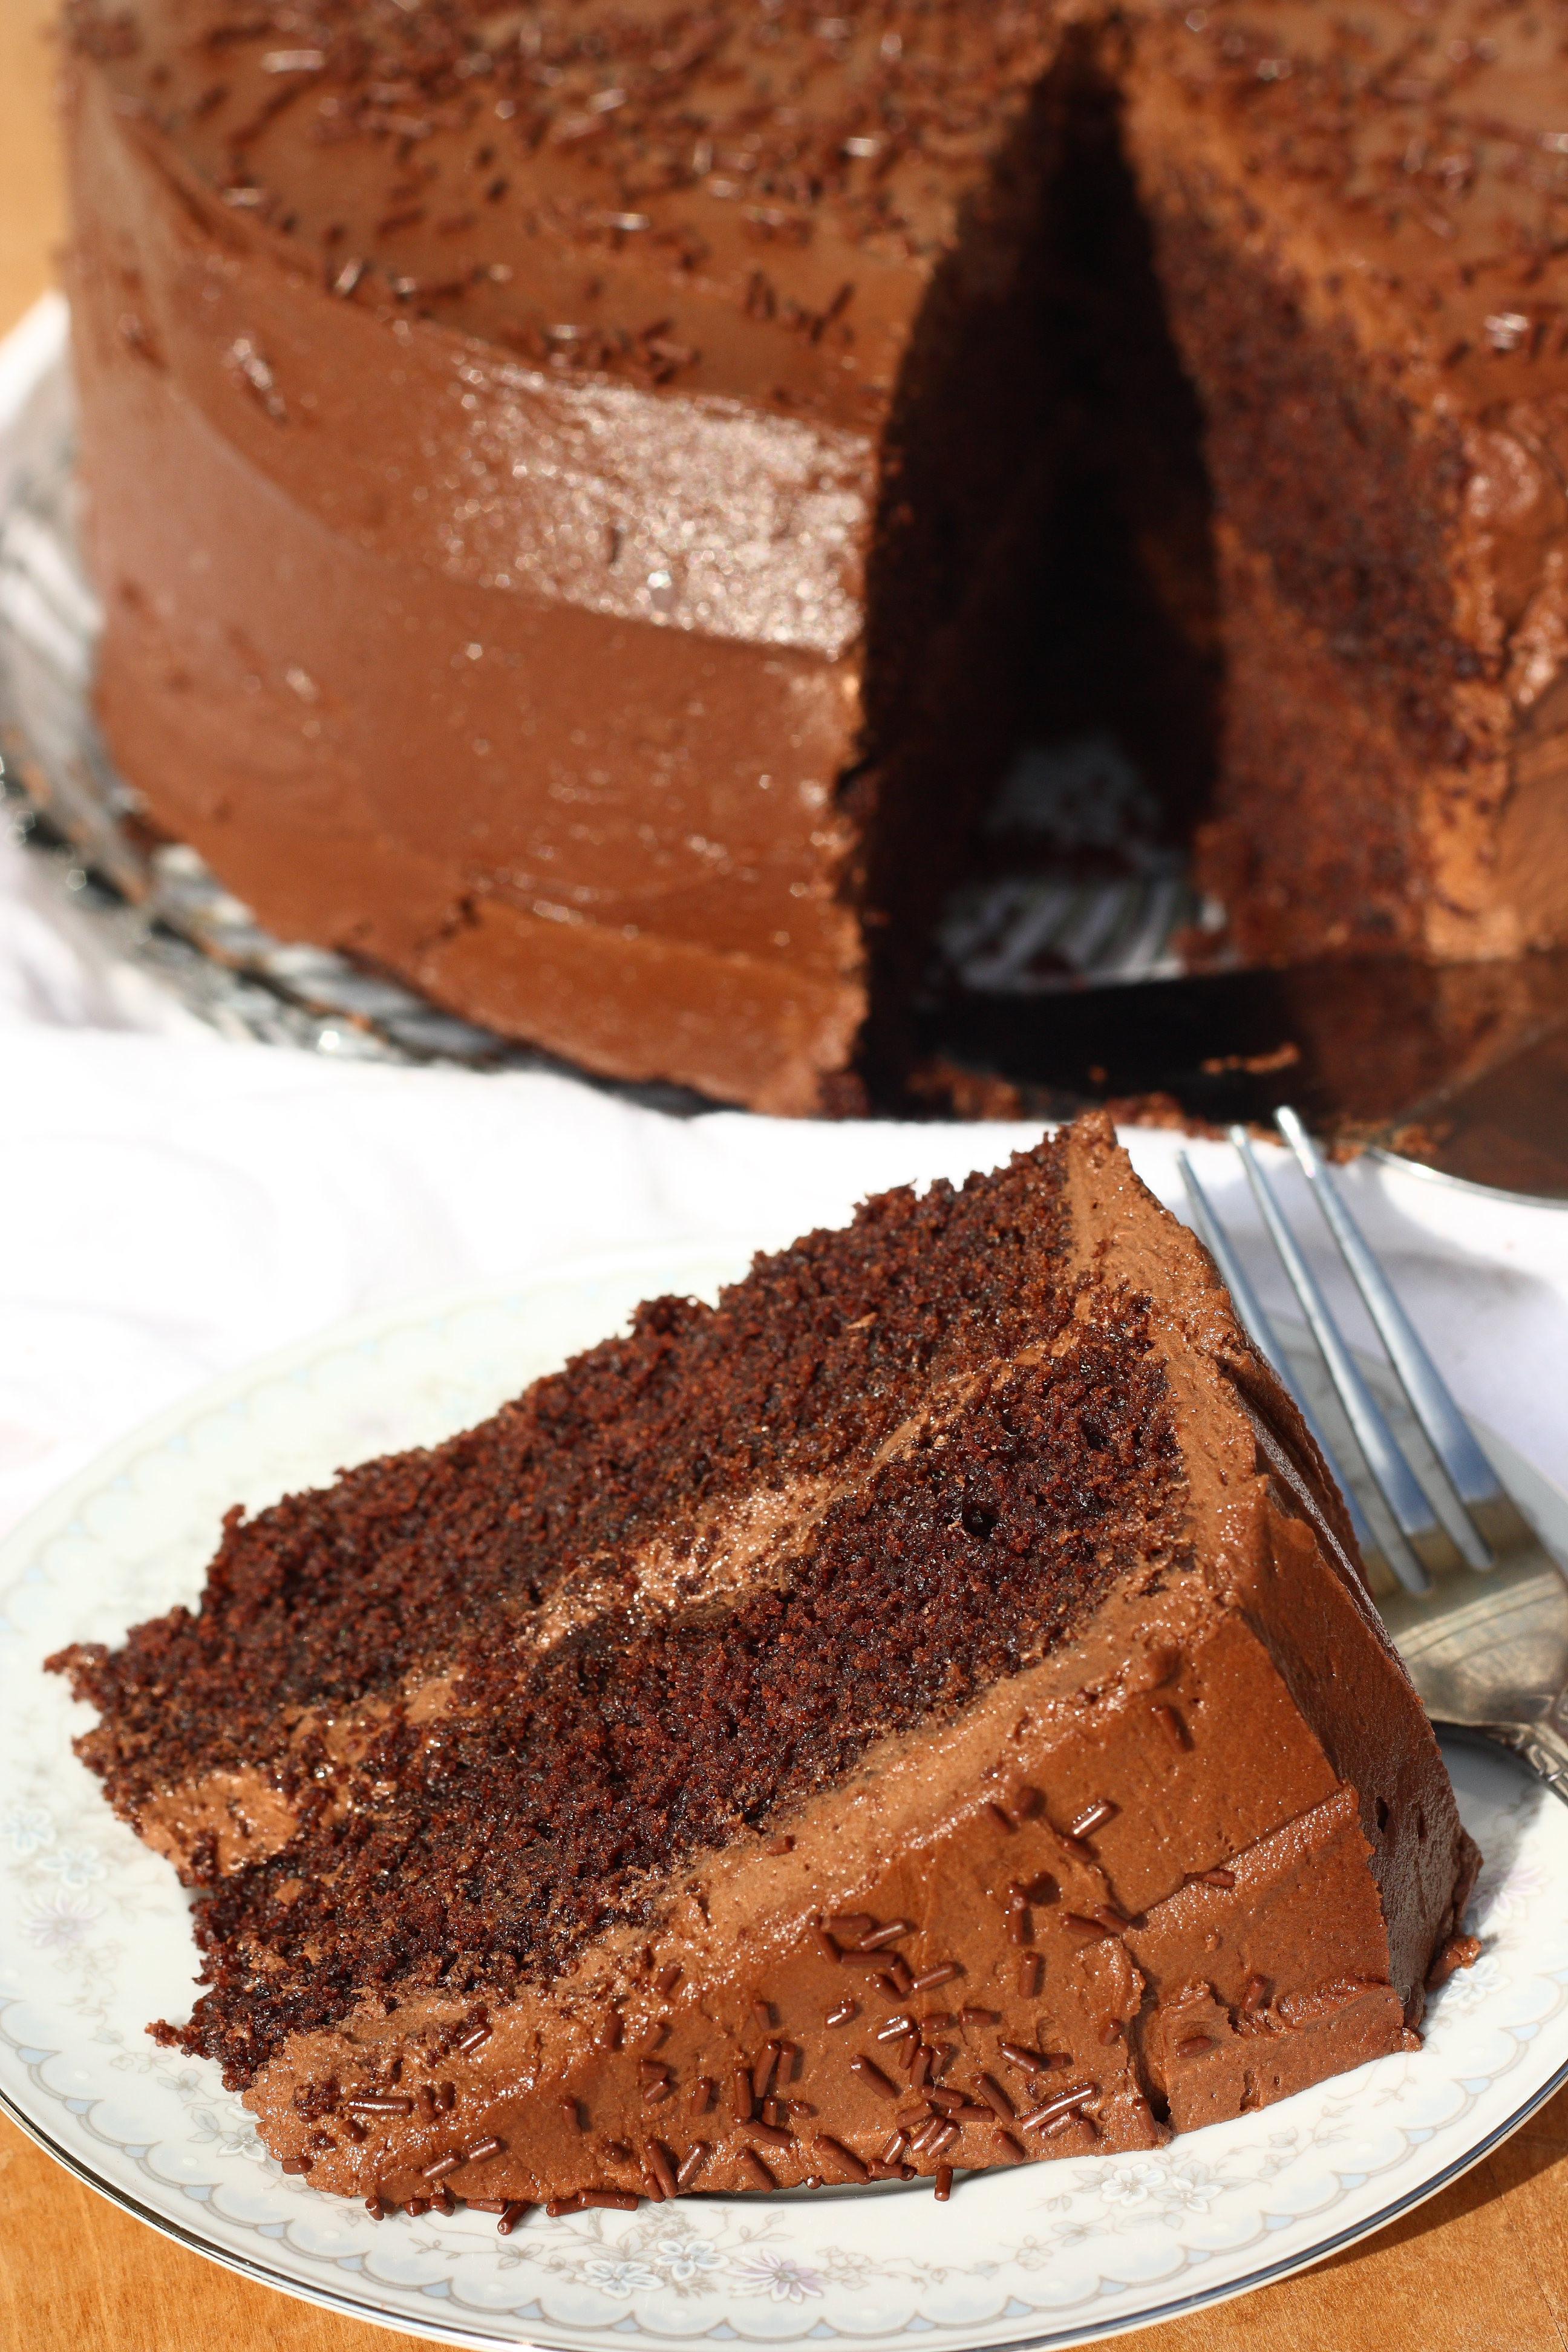 Gluten Free Chocolate Cake Recipe  Super Moist Gluten Free Chocolate Cake Recipe For Him